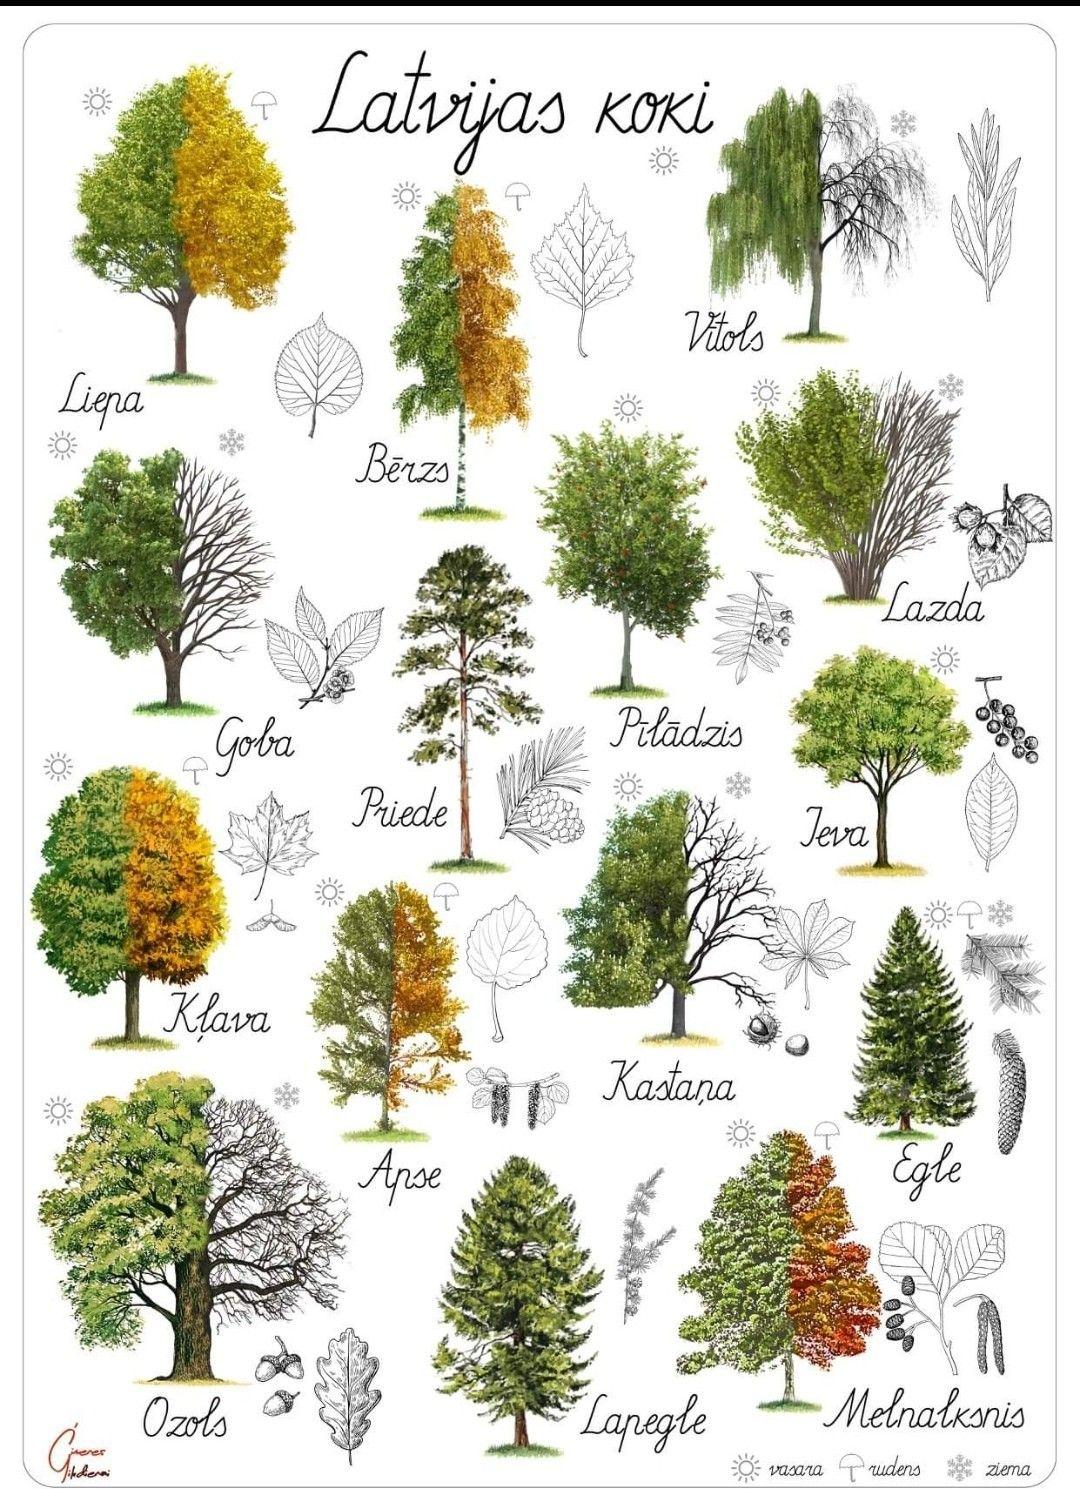 Latvian Trees